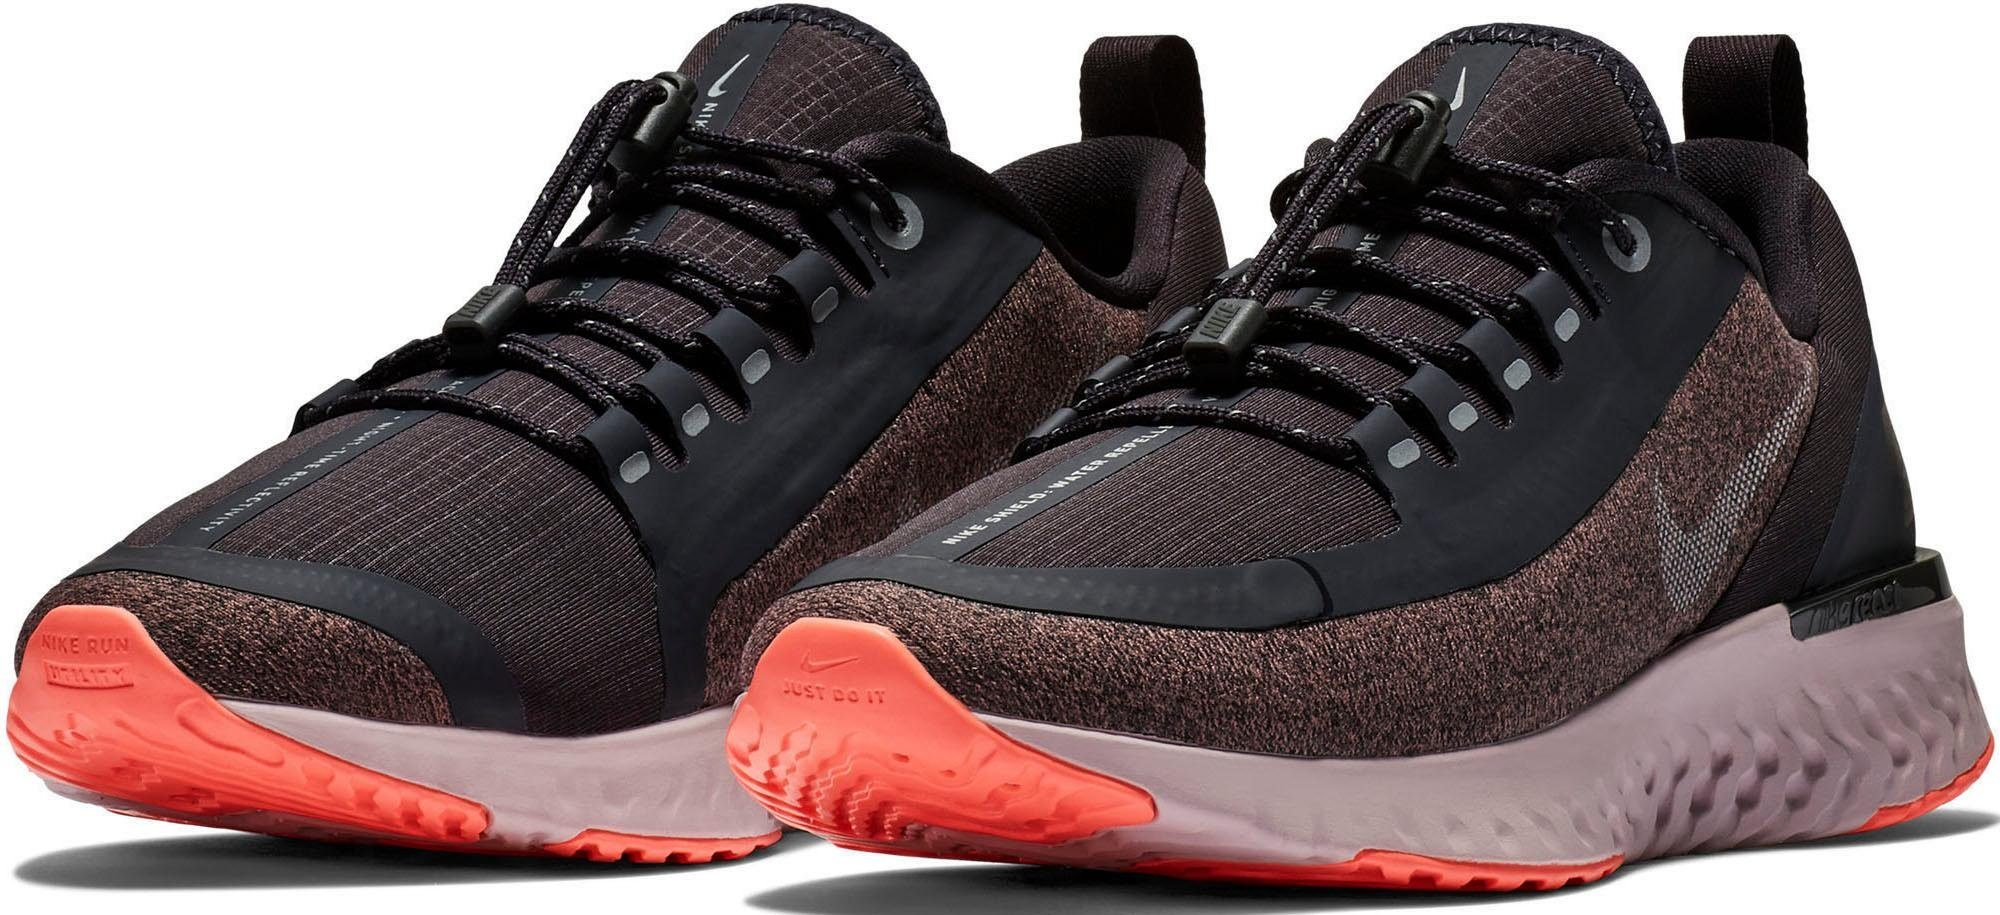 Nike »Wmns Odyssey React Shield« Laufschuh kaufen | OTTO